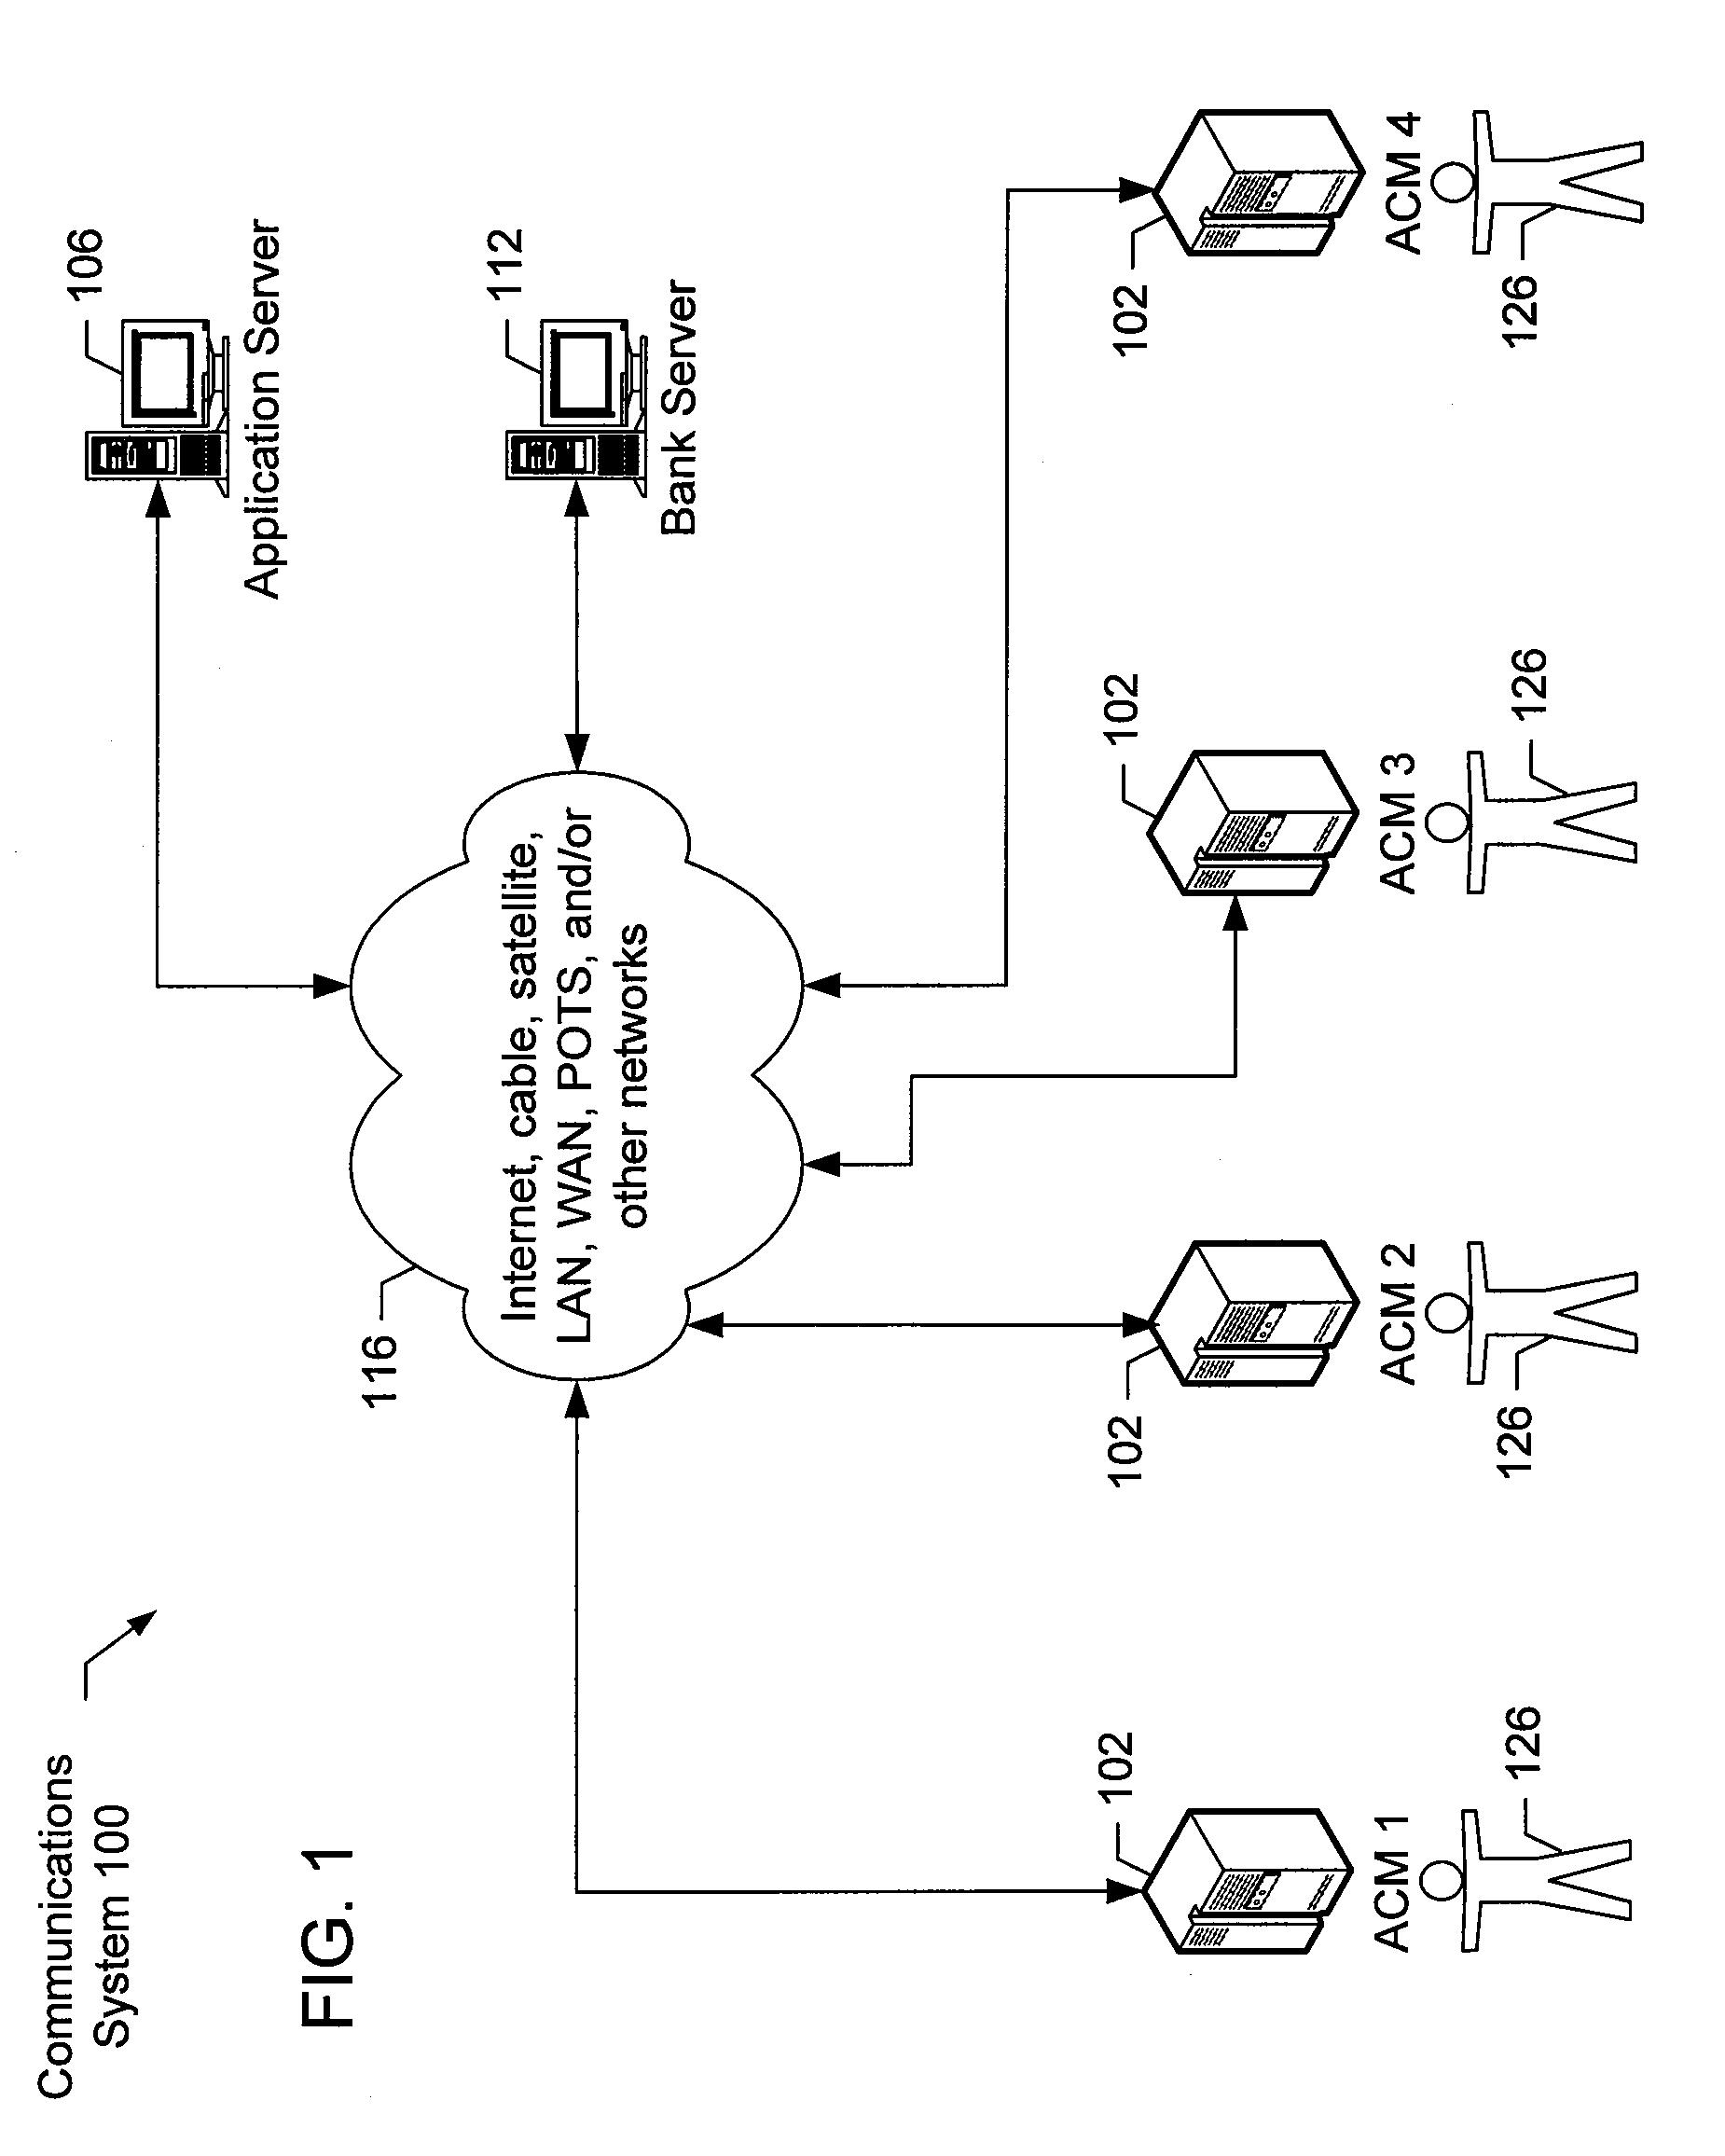 currency identifier machine